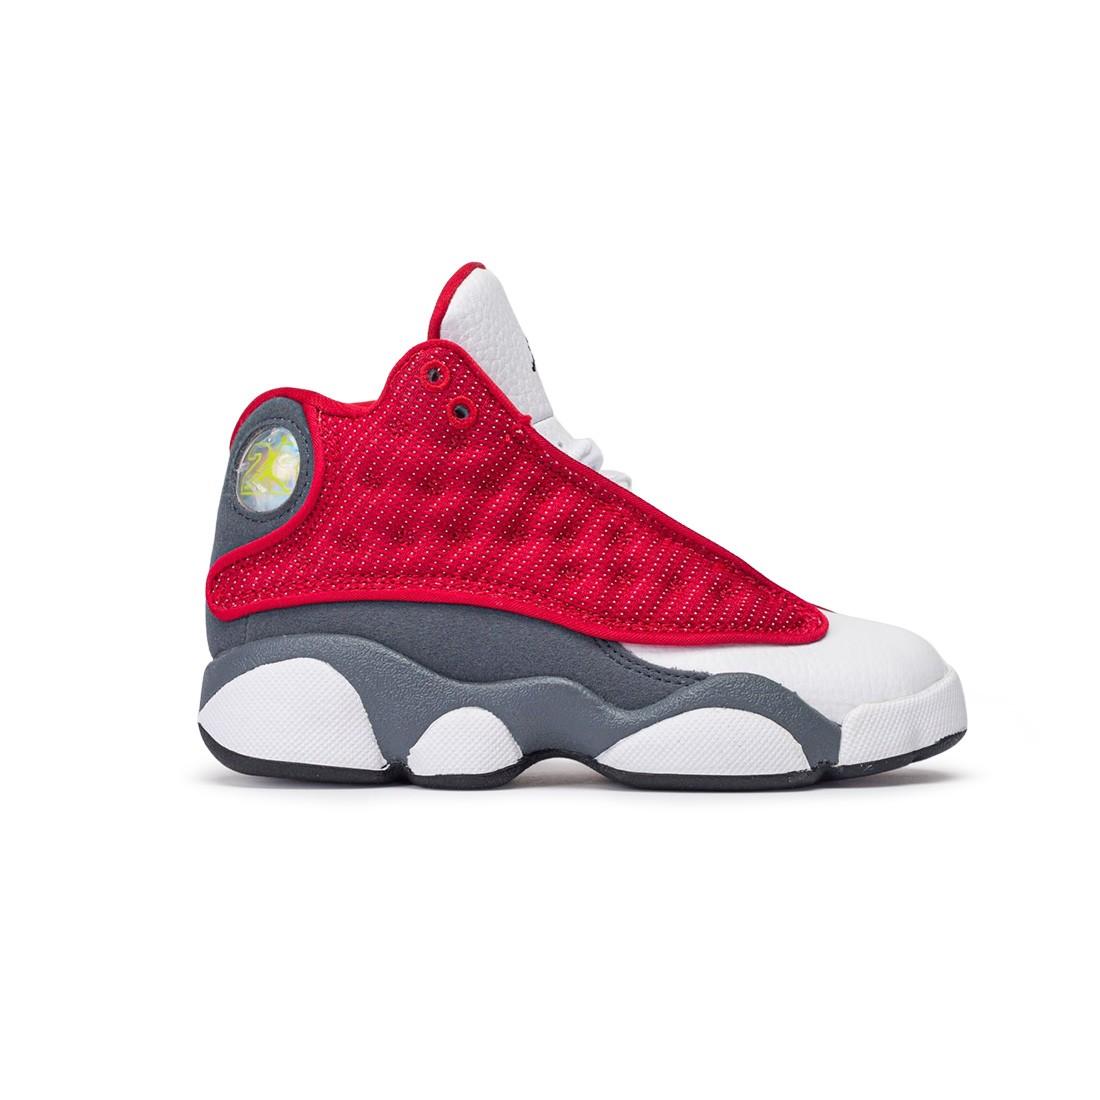 Jordan Little Kids 13 Retro (gym red / black-flint grey-white)